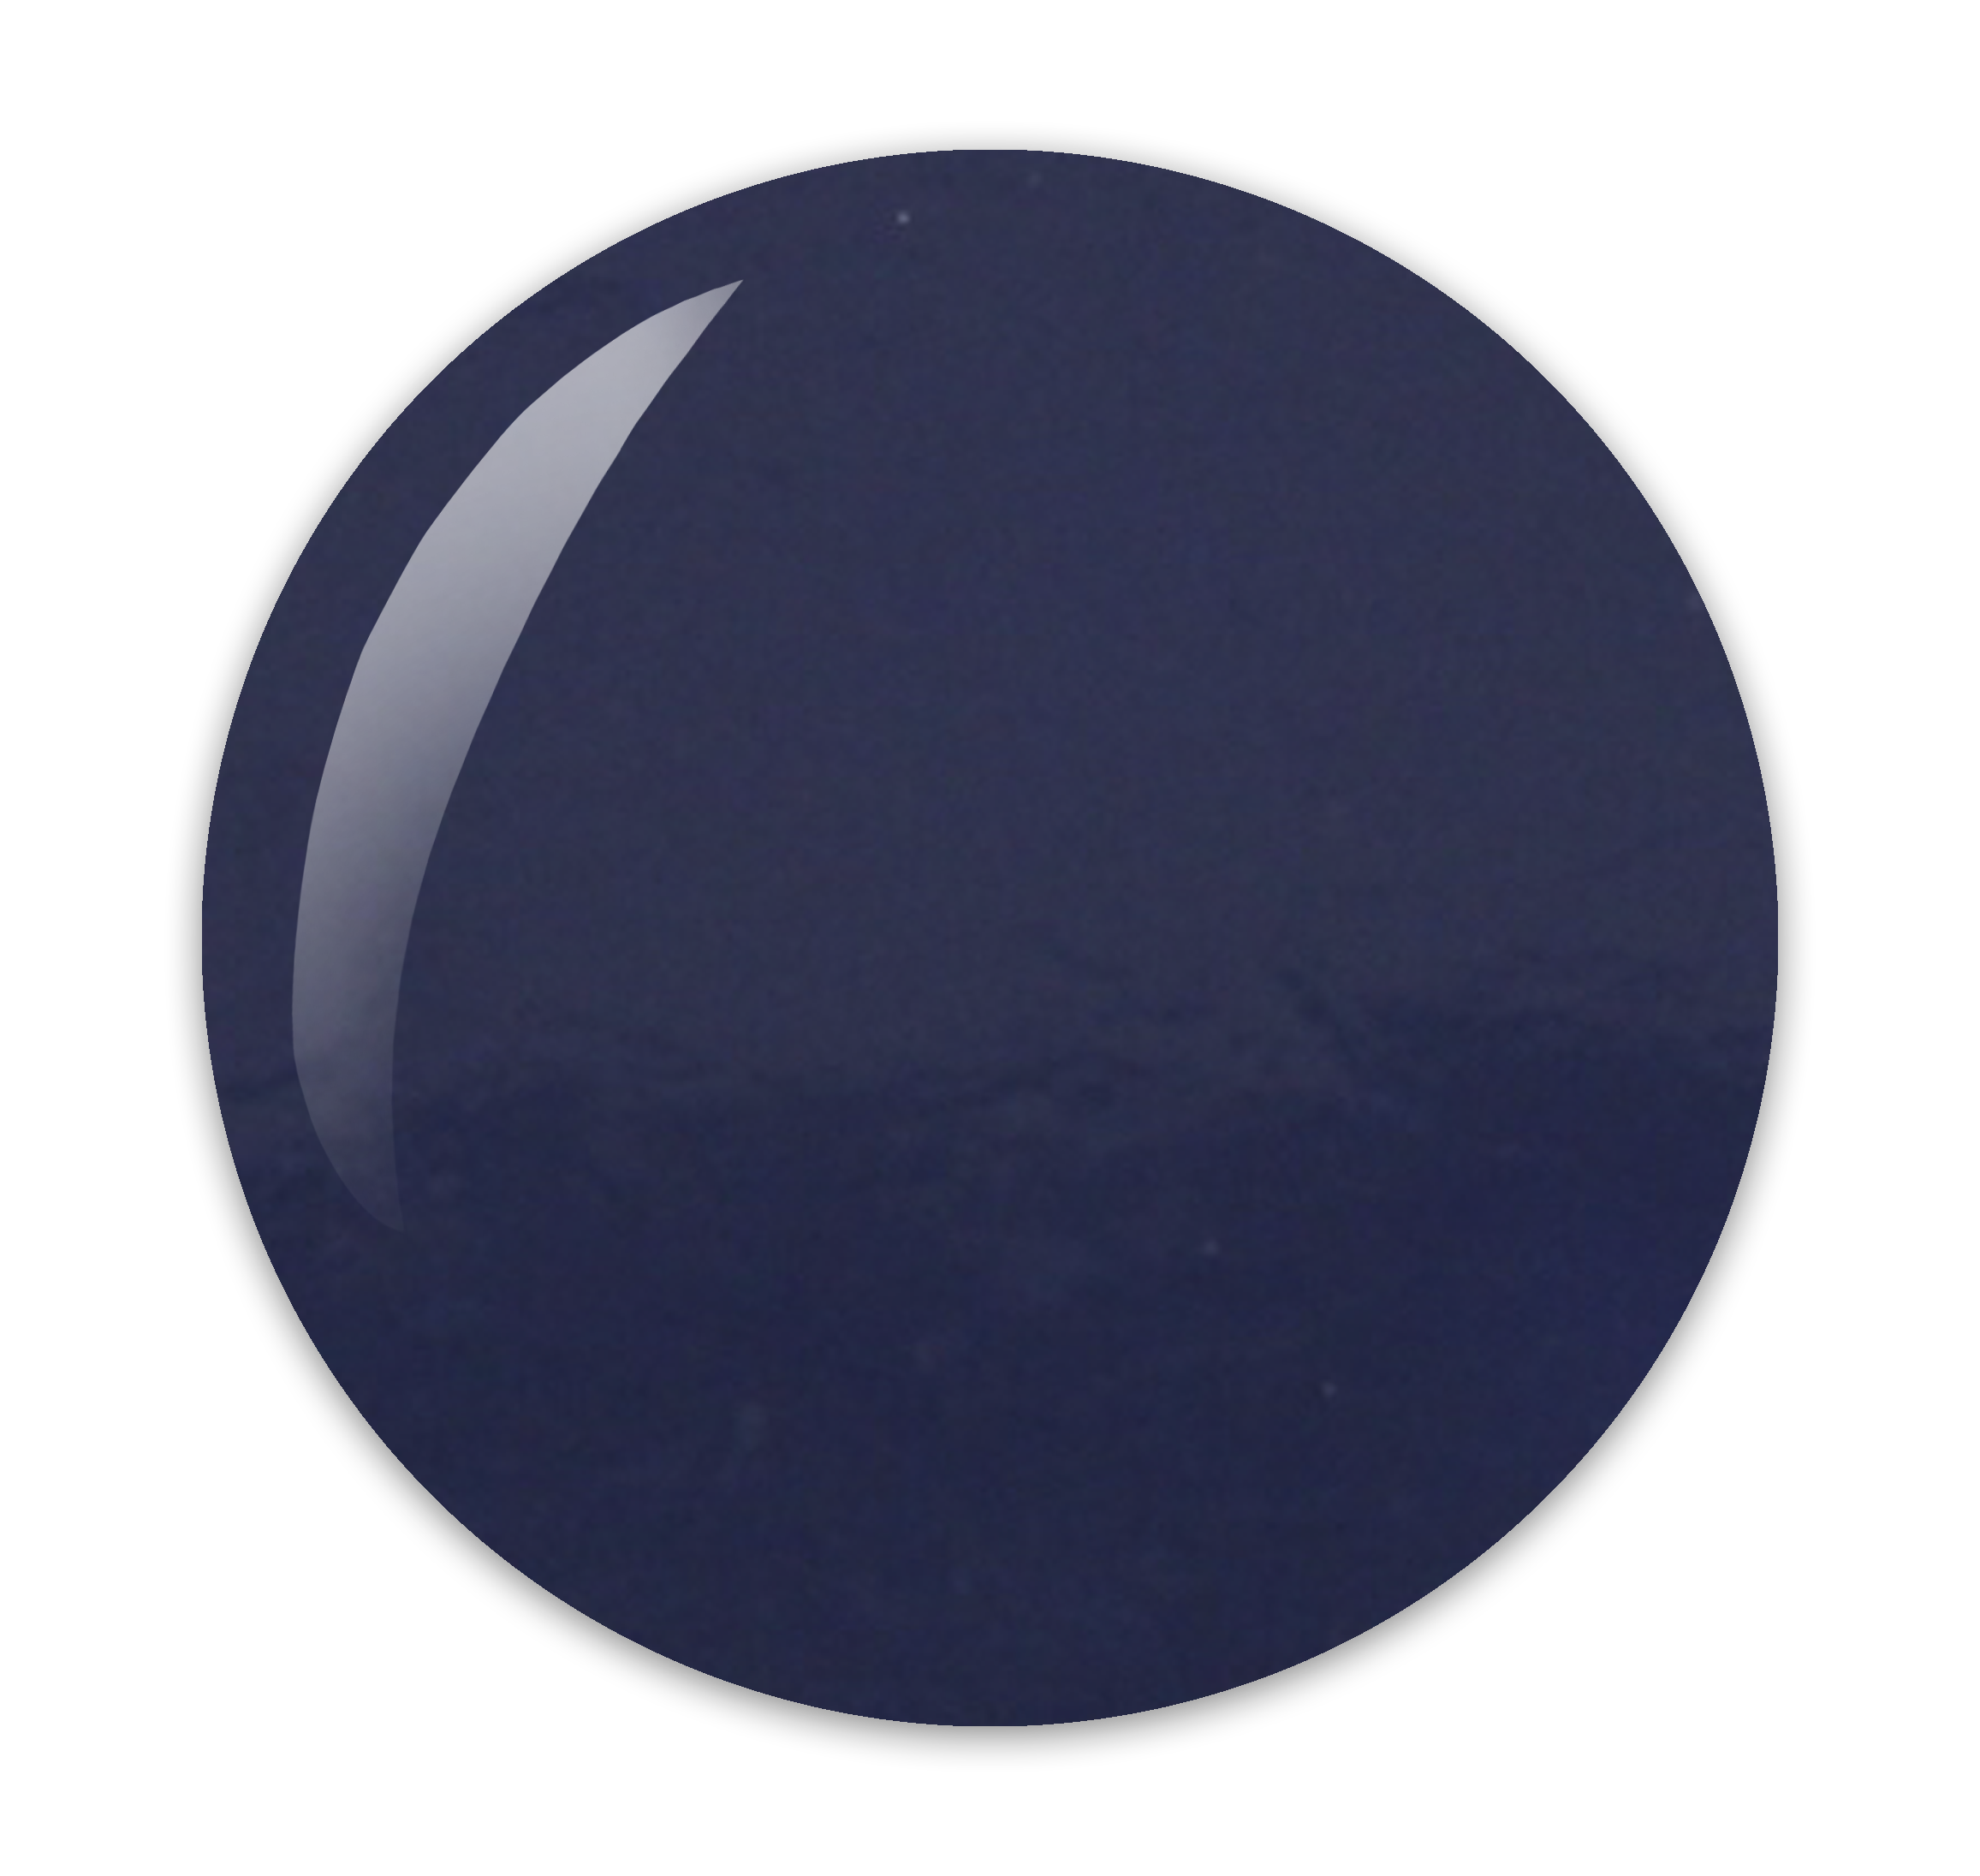 Donker blauwe nagellak nummer 54 uit Herôme nagellak collectie